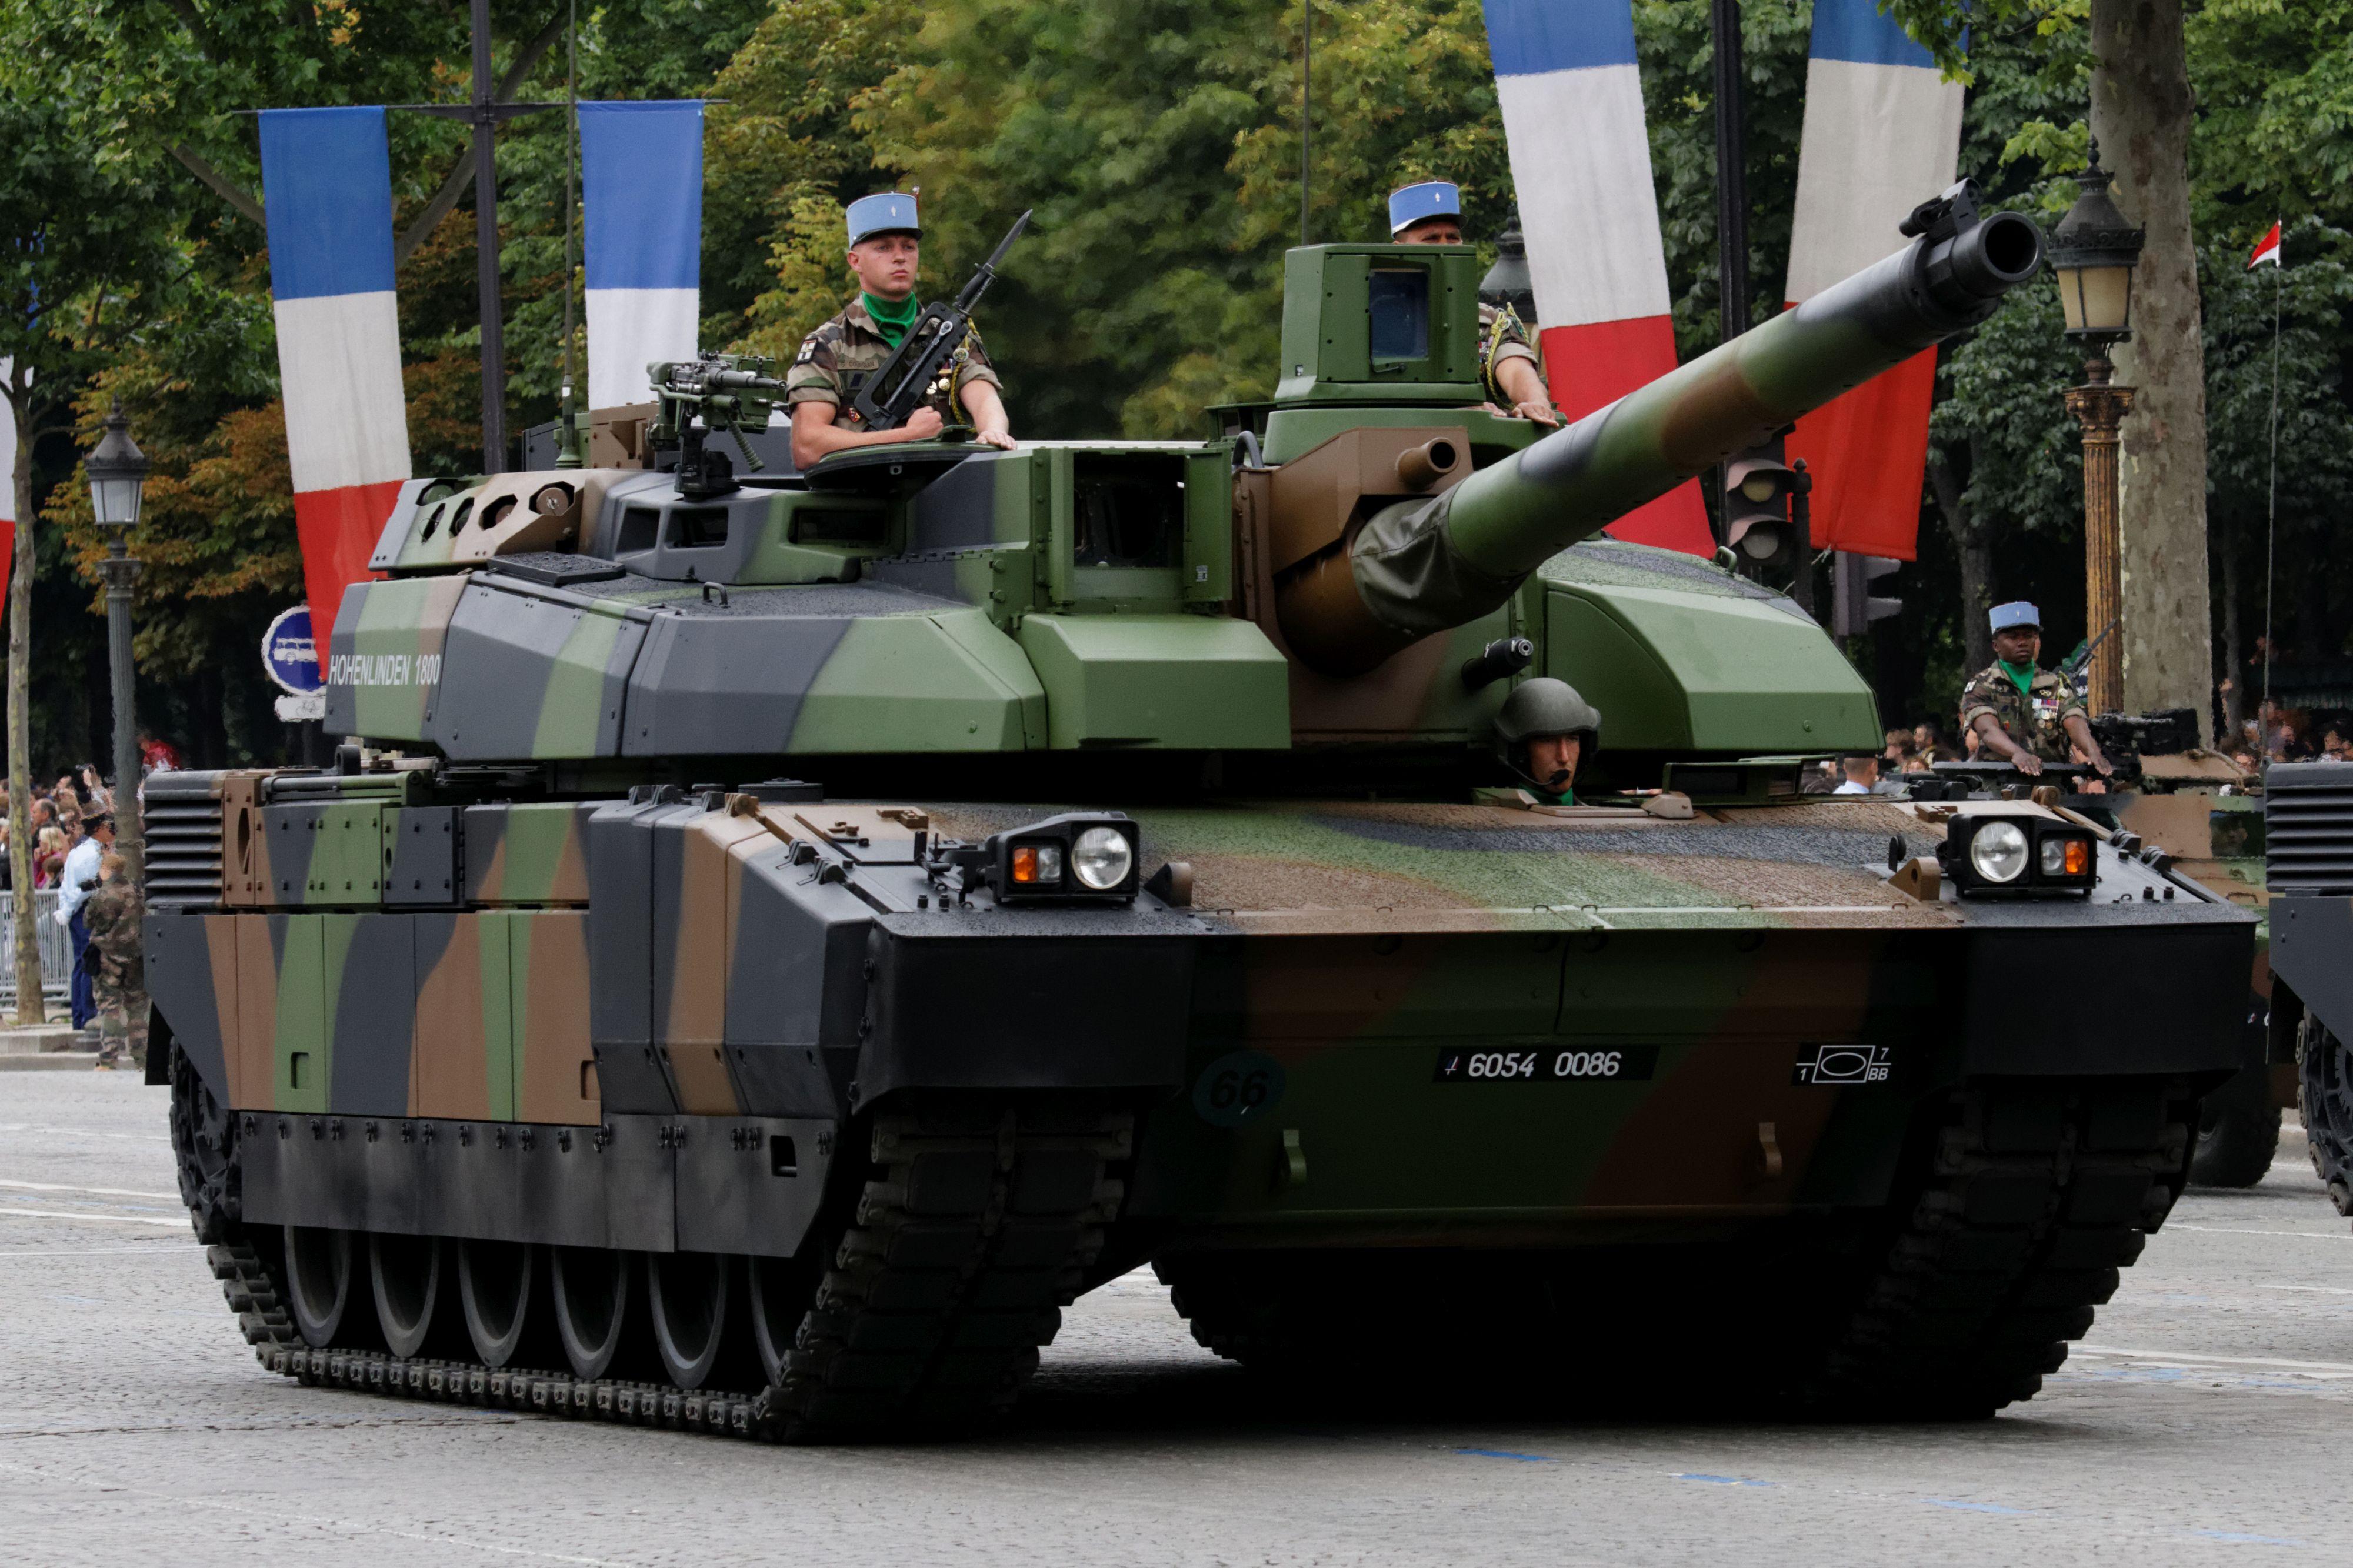 military-amx-leclerc-1069